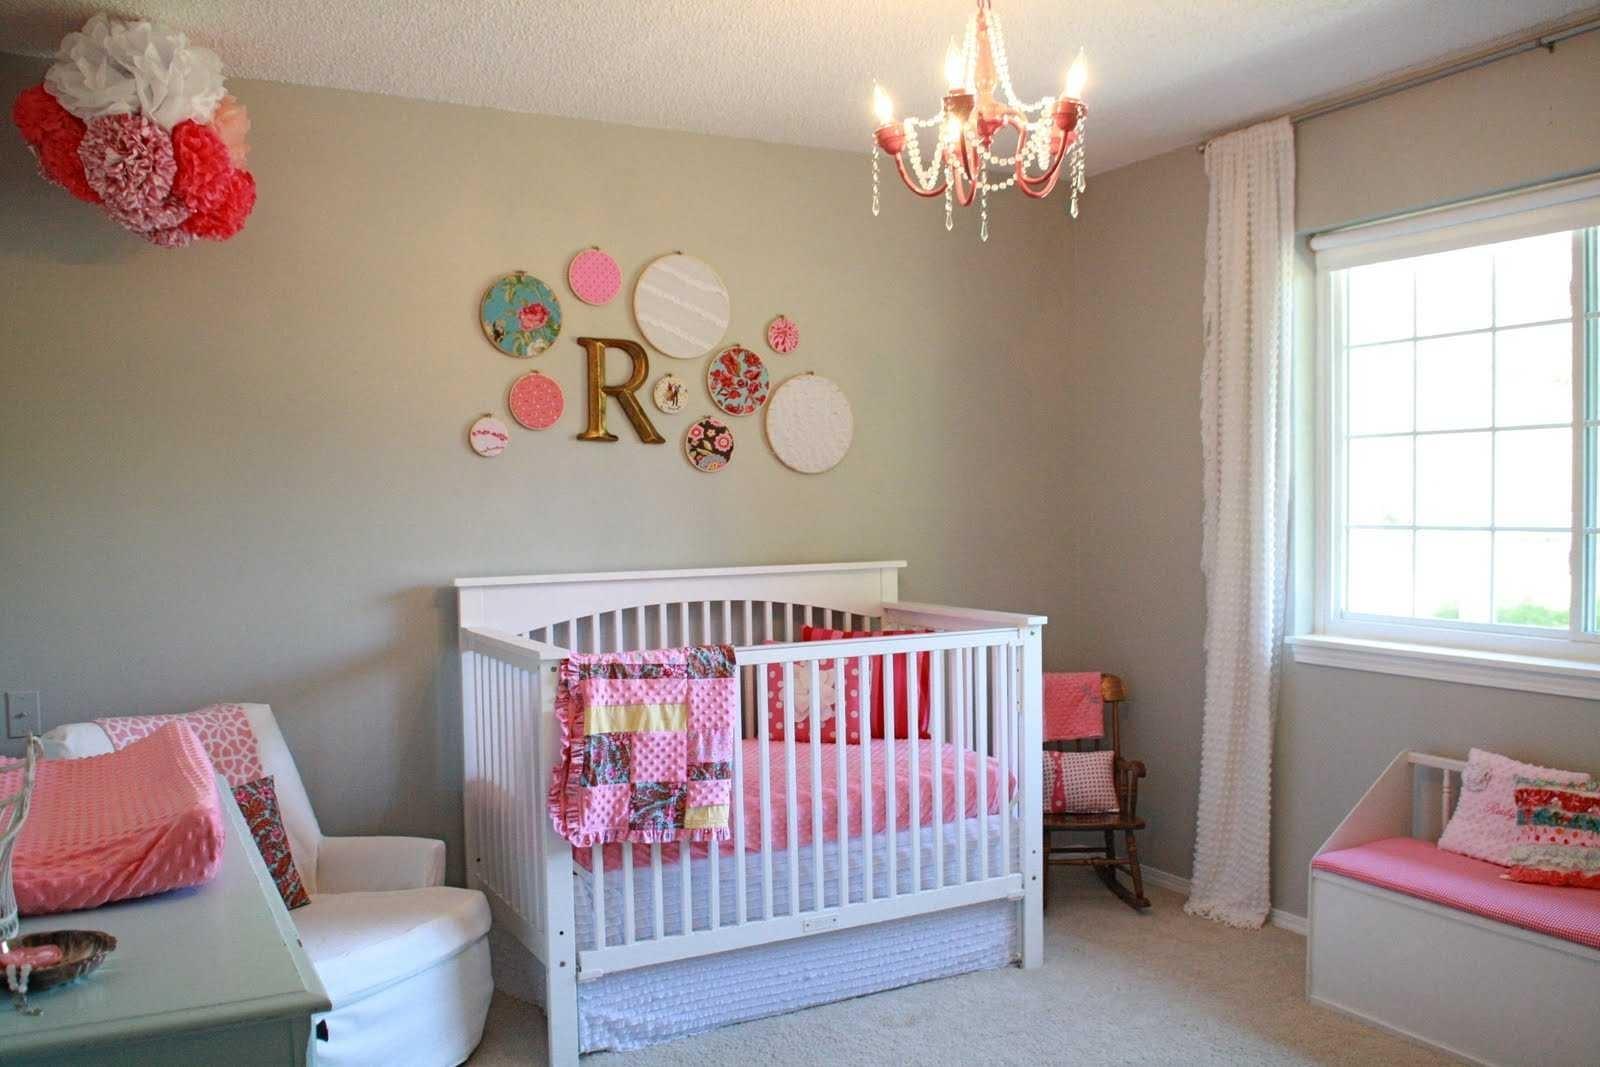 10 Spectacular Baby Girl Room Theme Ideas %name